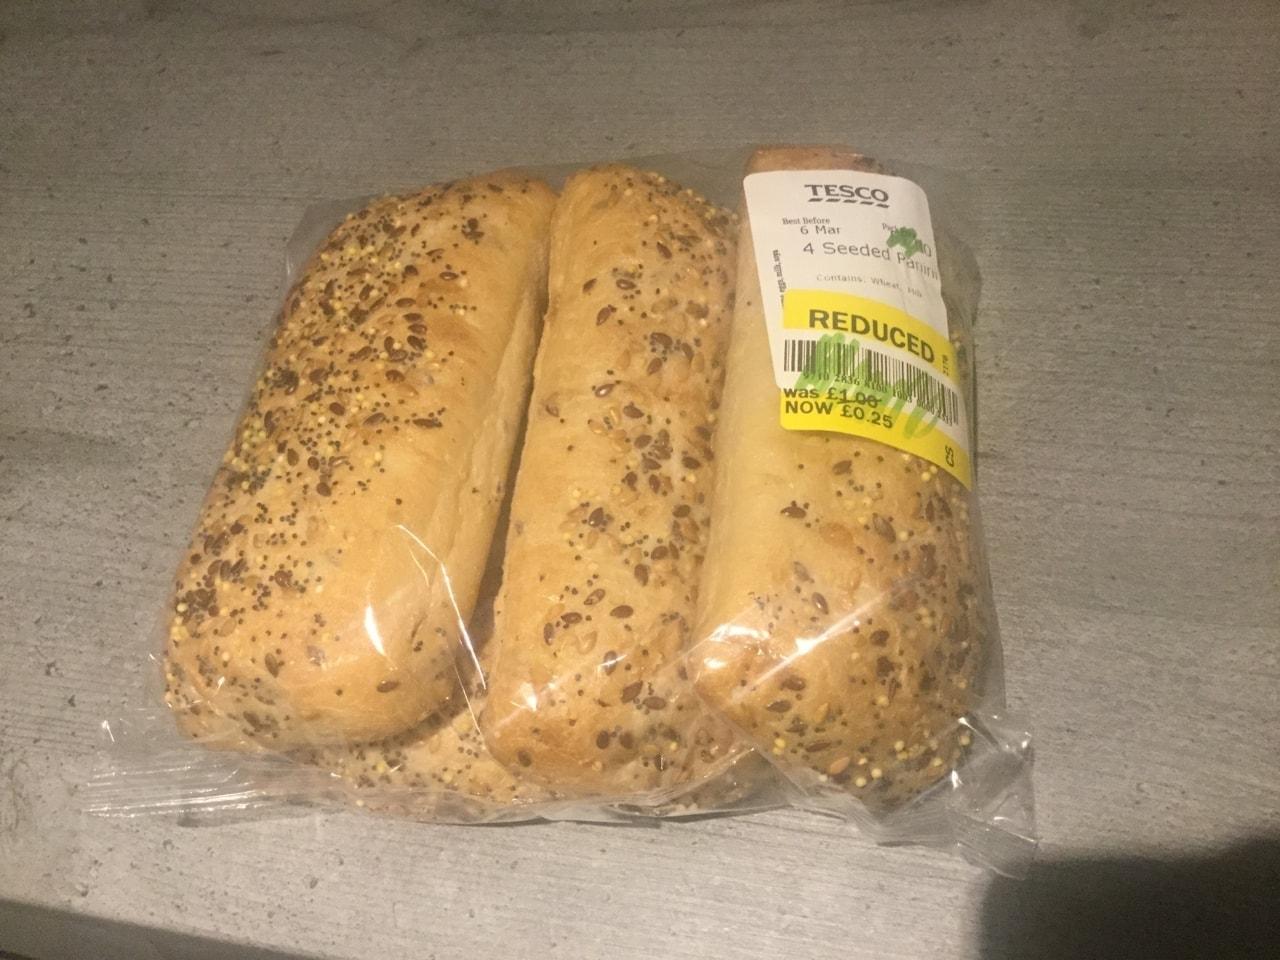 Seeded panini